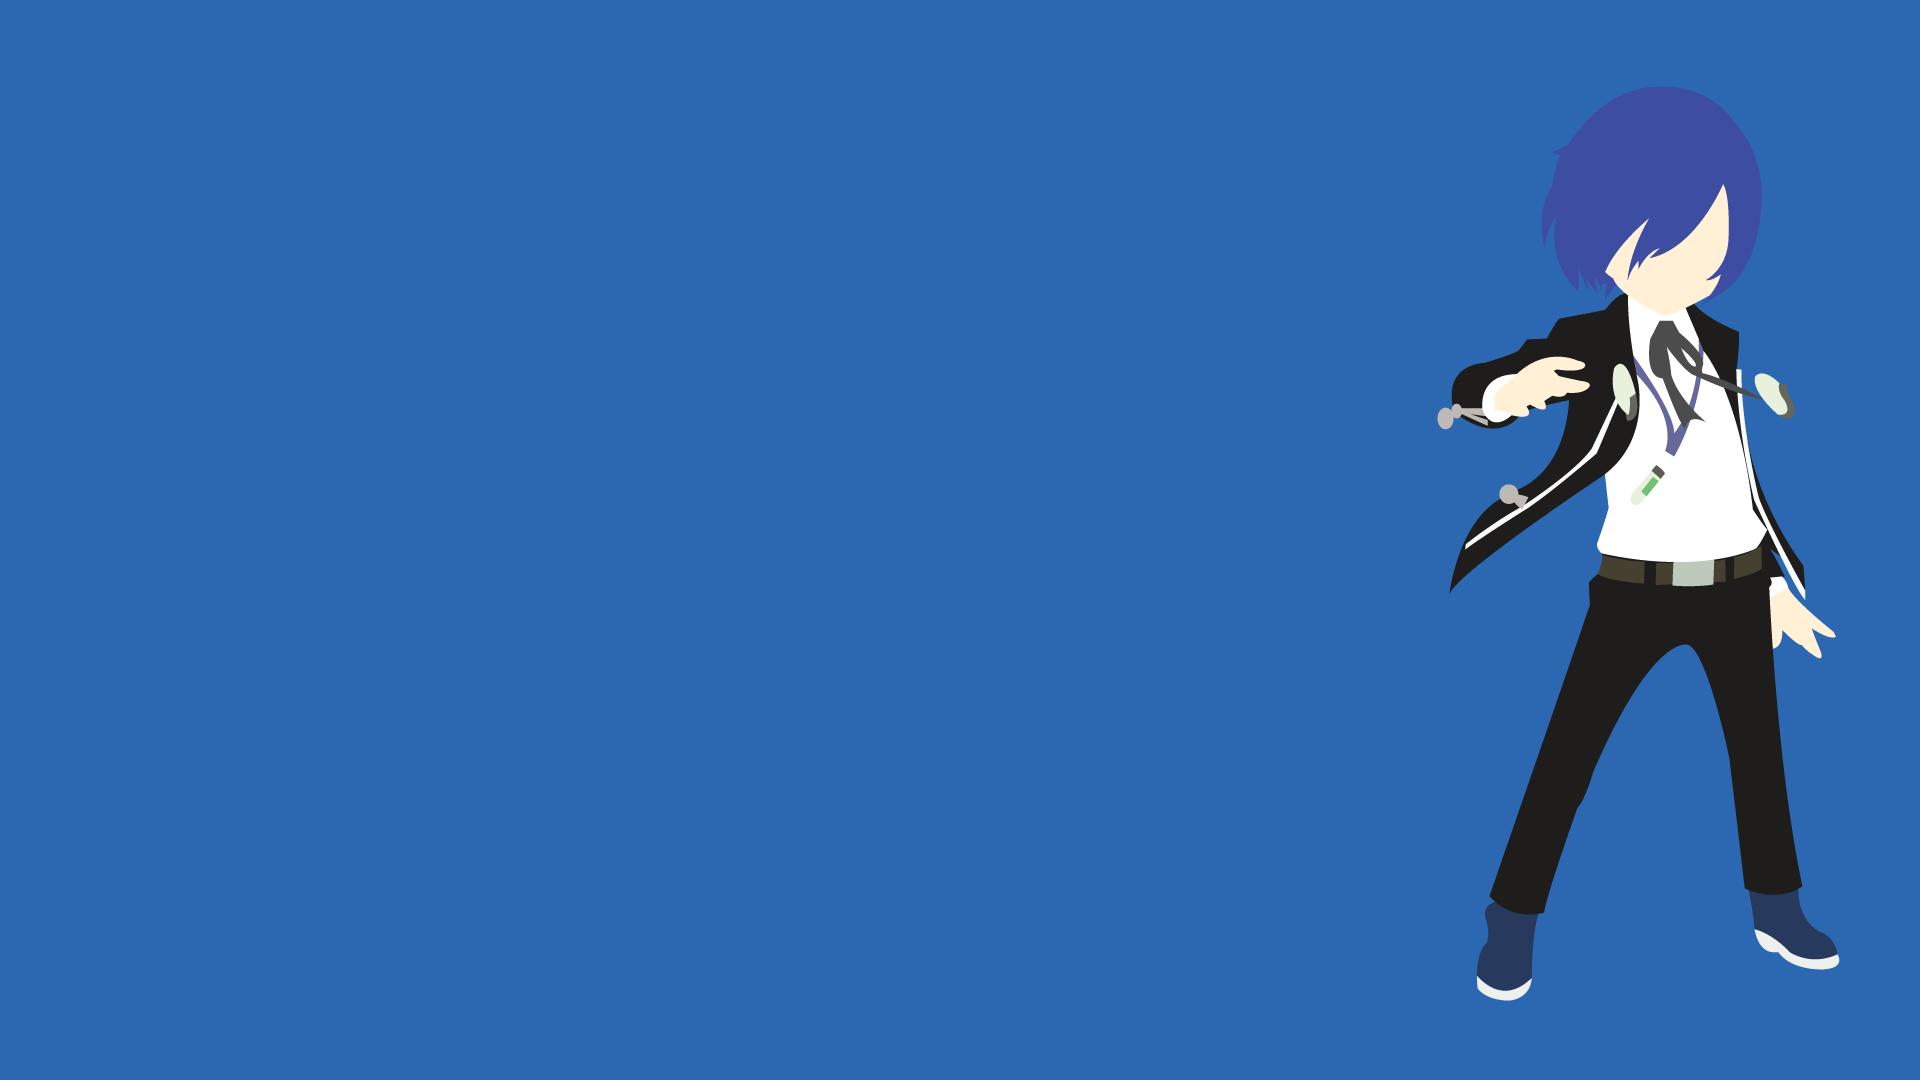 Minato Yuki Full HD Wallpaper And Background Image